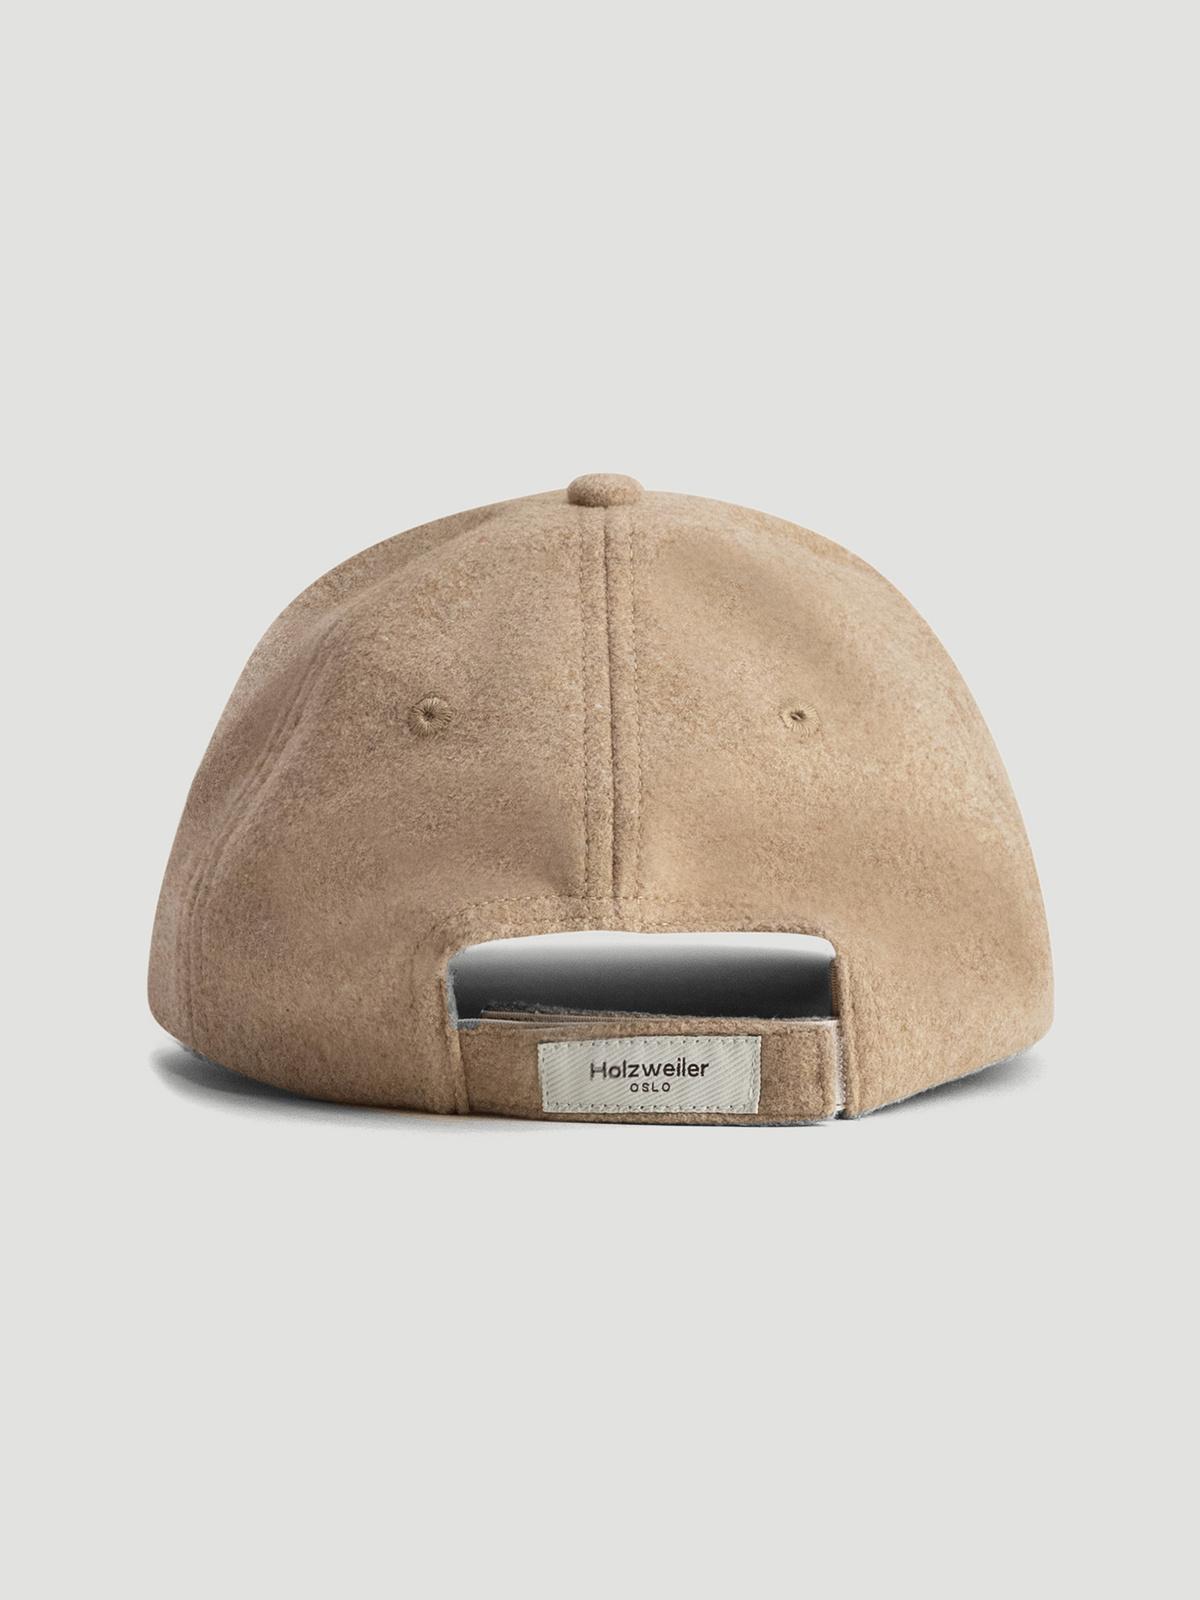 Holzweiler Wool Caps  Beige 4